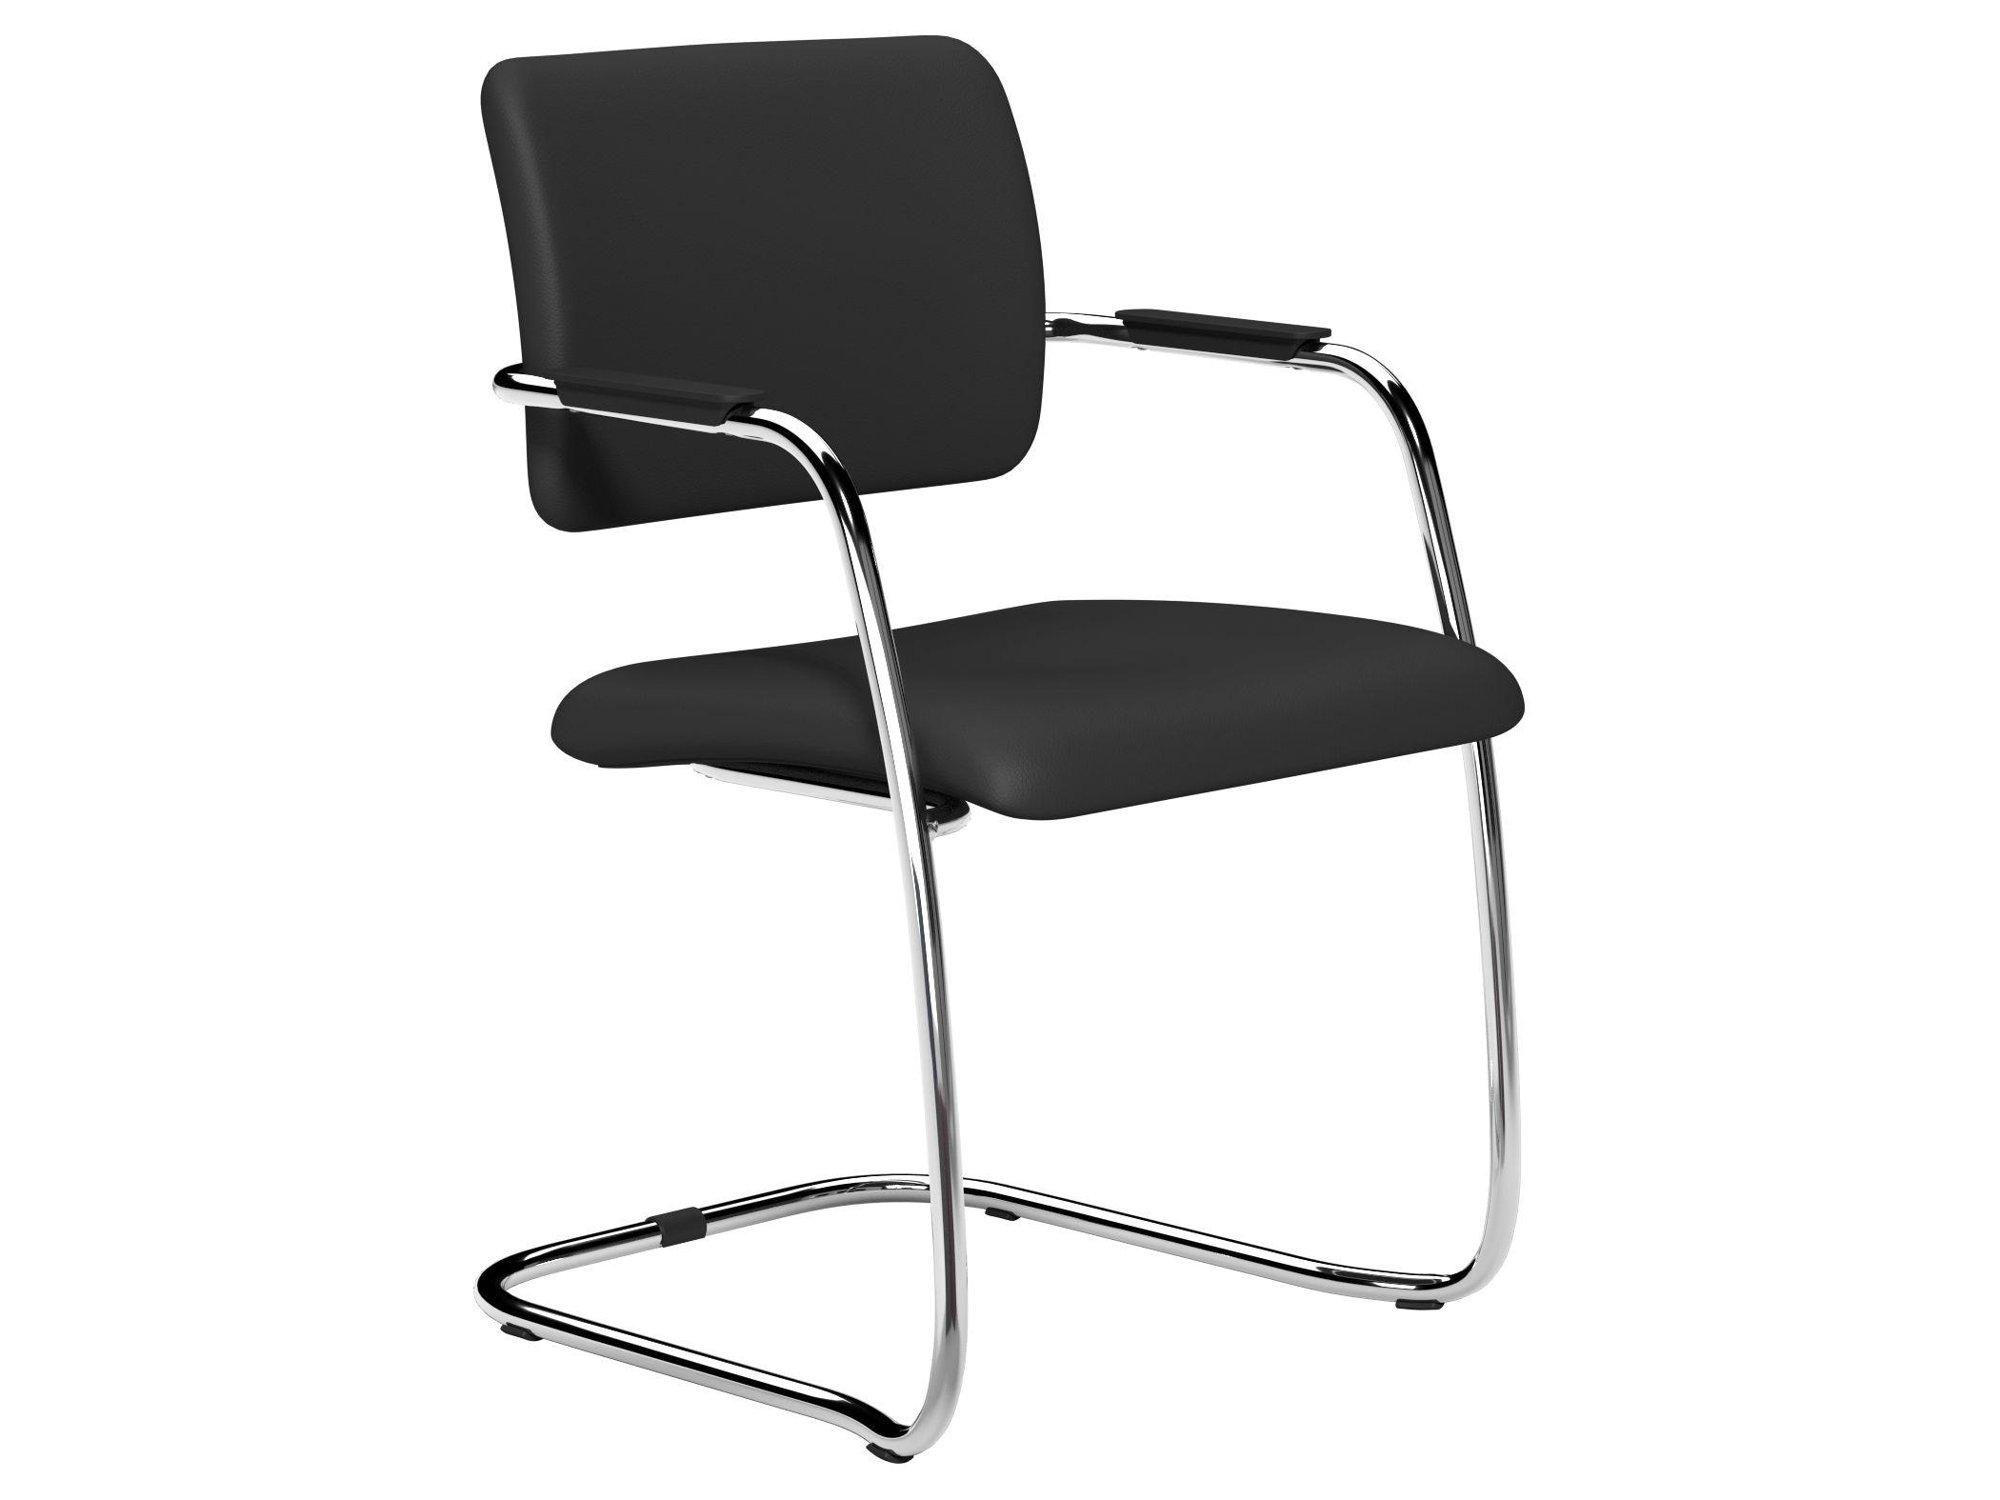 O.Q Series Mid Back Stacking Chair Chrome - Lotus Black L001